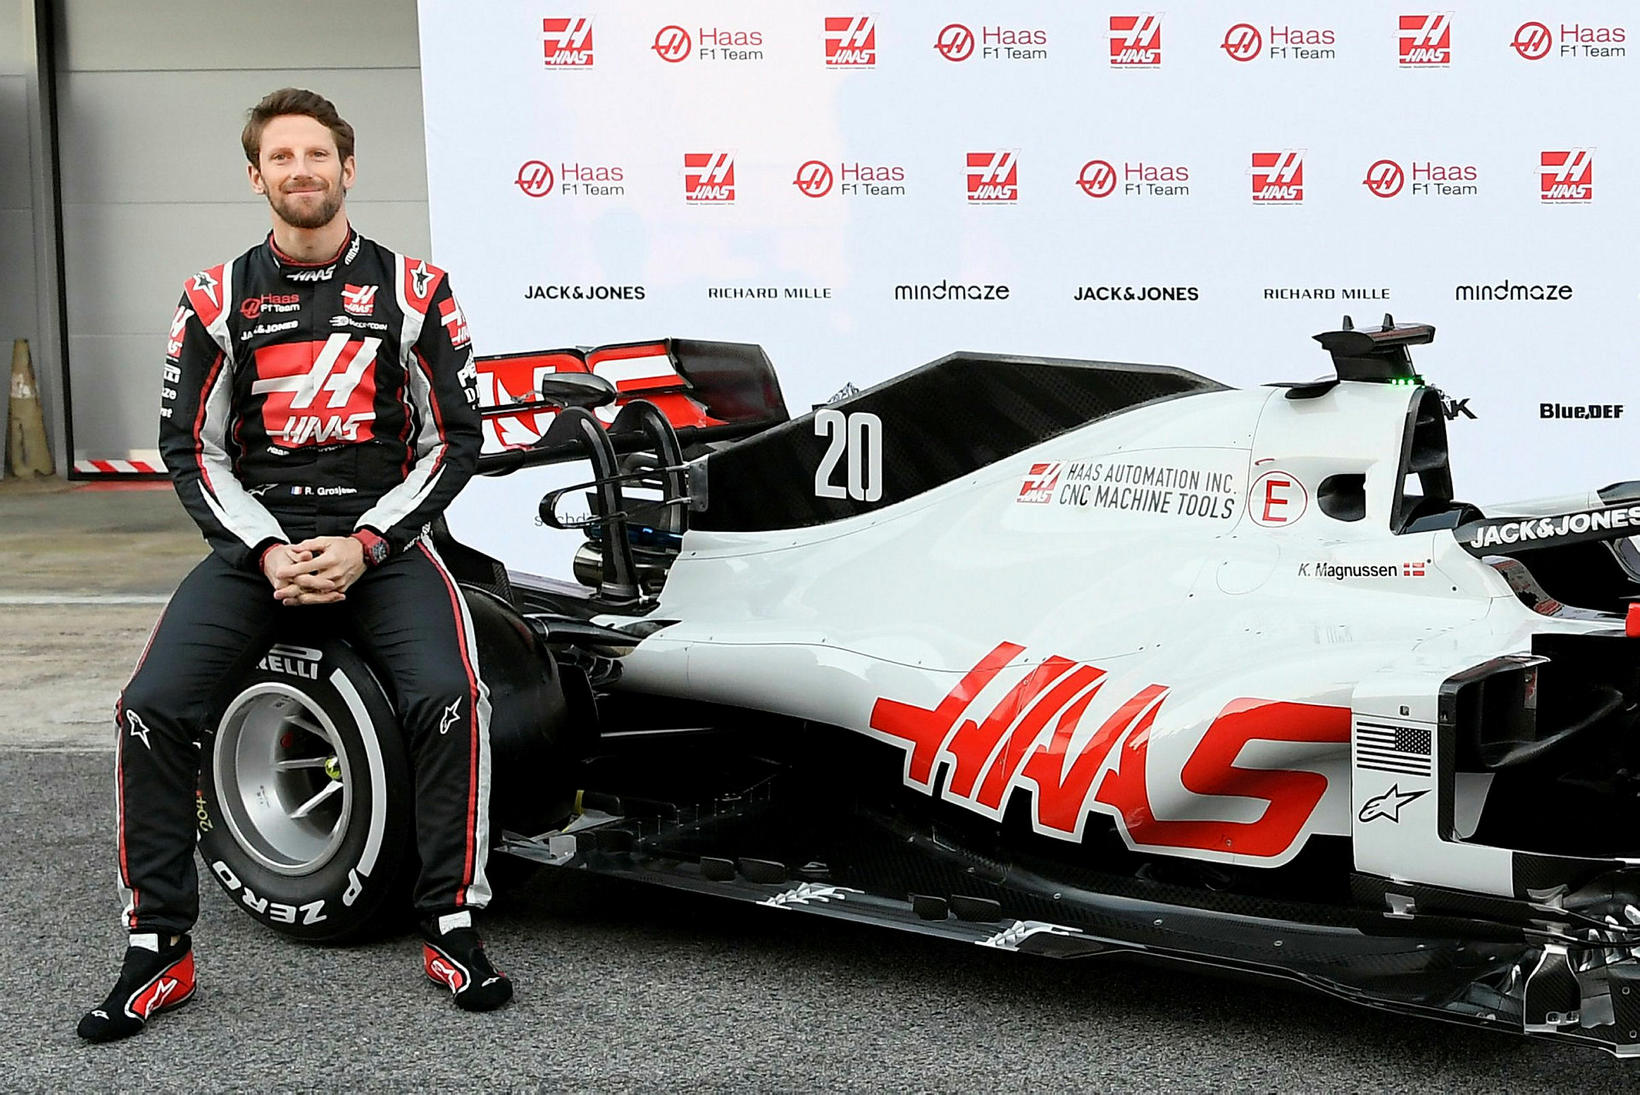 Romain Grosjean á Haasbíl sínum.